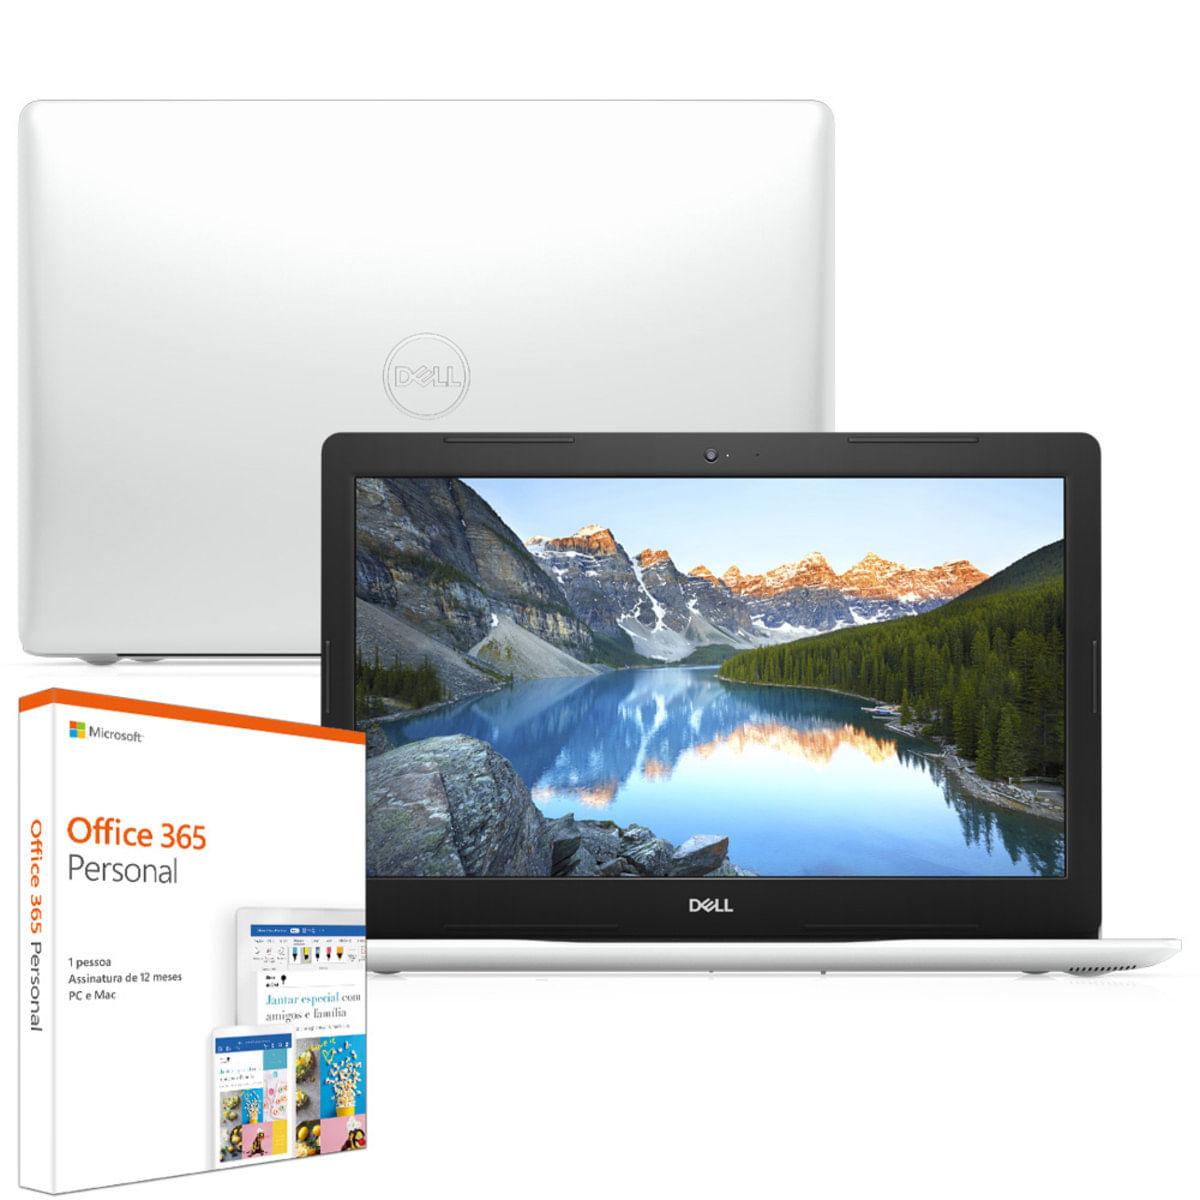 Notebook - Dell I14-3481-m200sf I3-7020u 3.20ghz 4gb 128gb Ssd Intel Hd Graphics 620 Windows 10 Home Inspiron 14